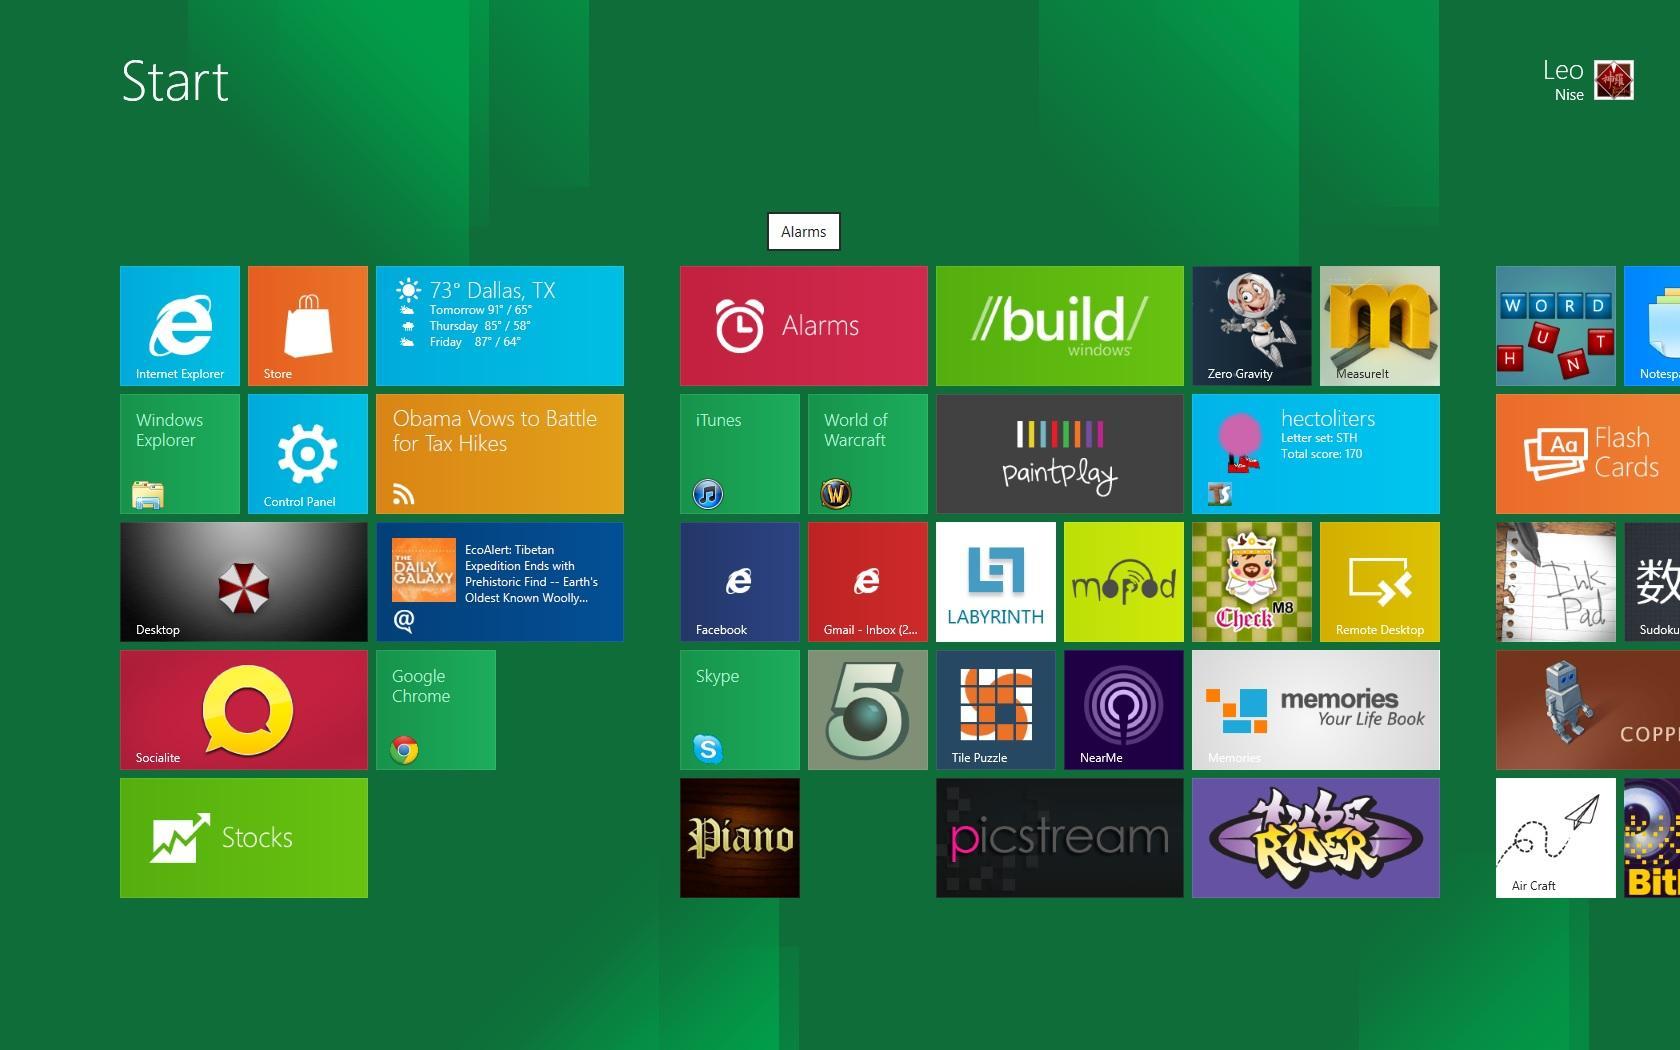 Windows 8 computer - Windows 8 Computer 31